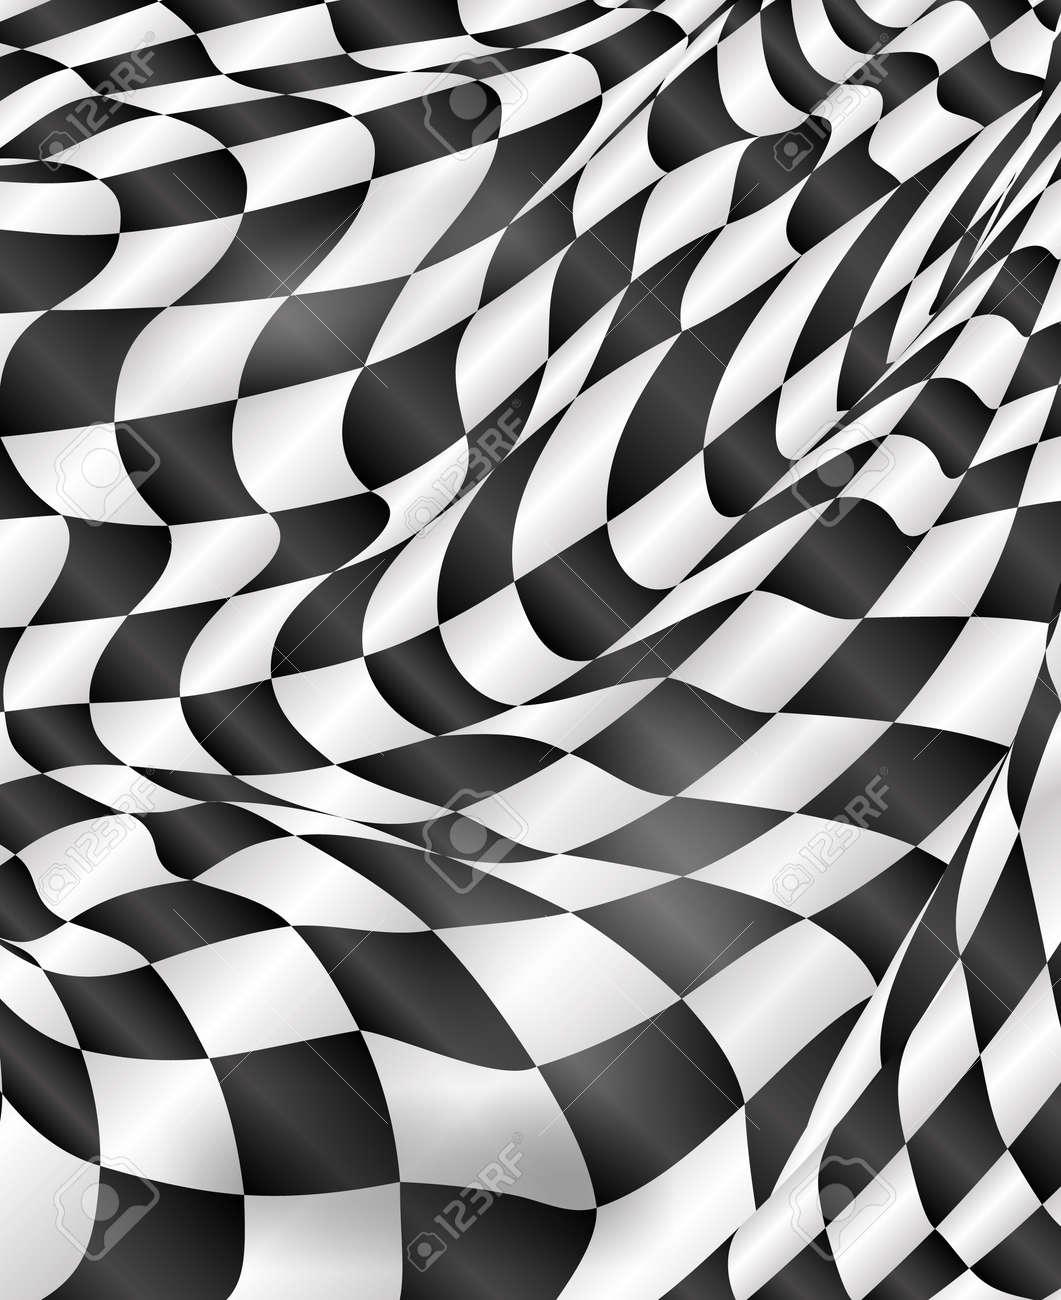 Checkered Design Checkered Flag Background Race Flag Design Vector Royalty Free